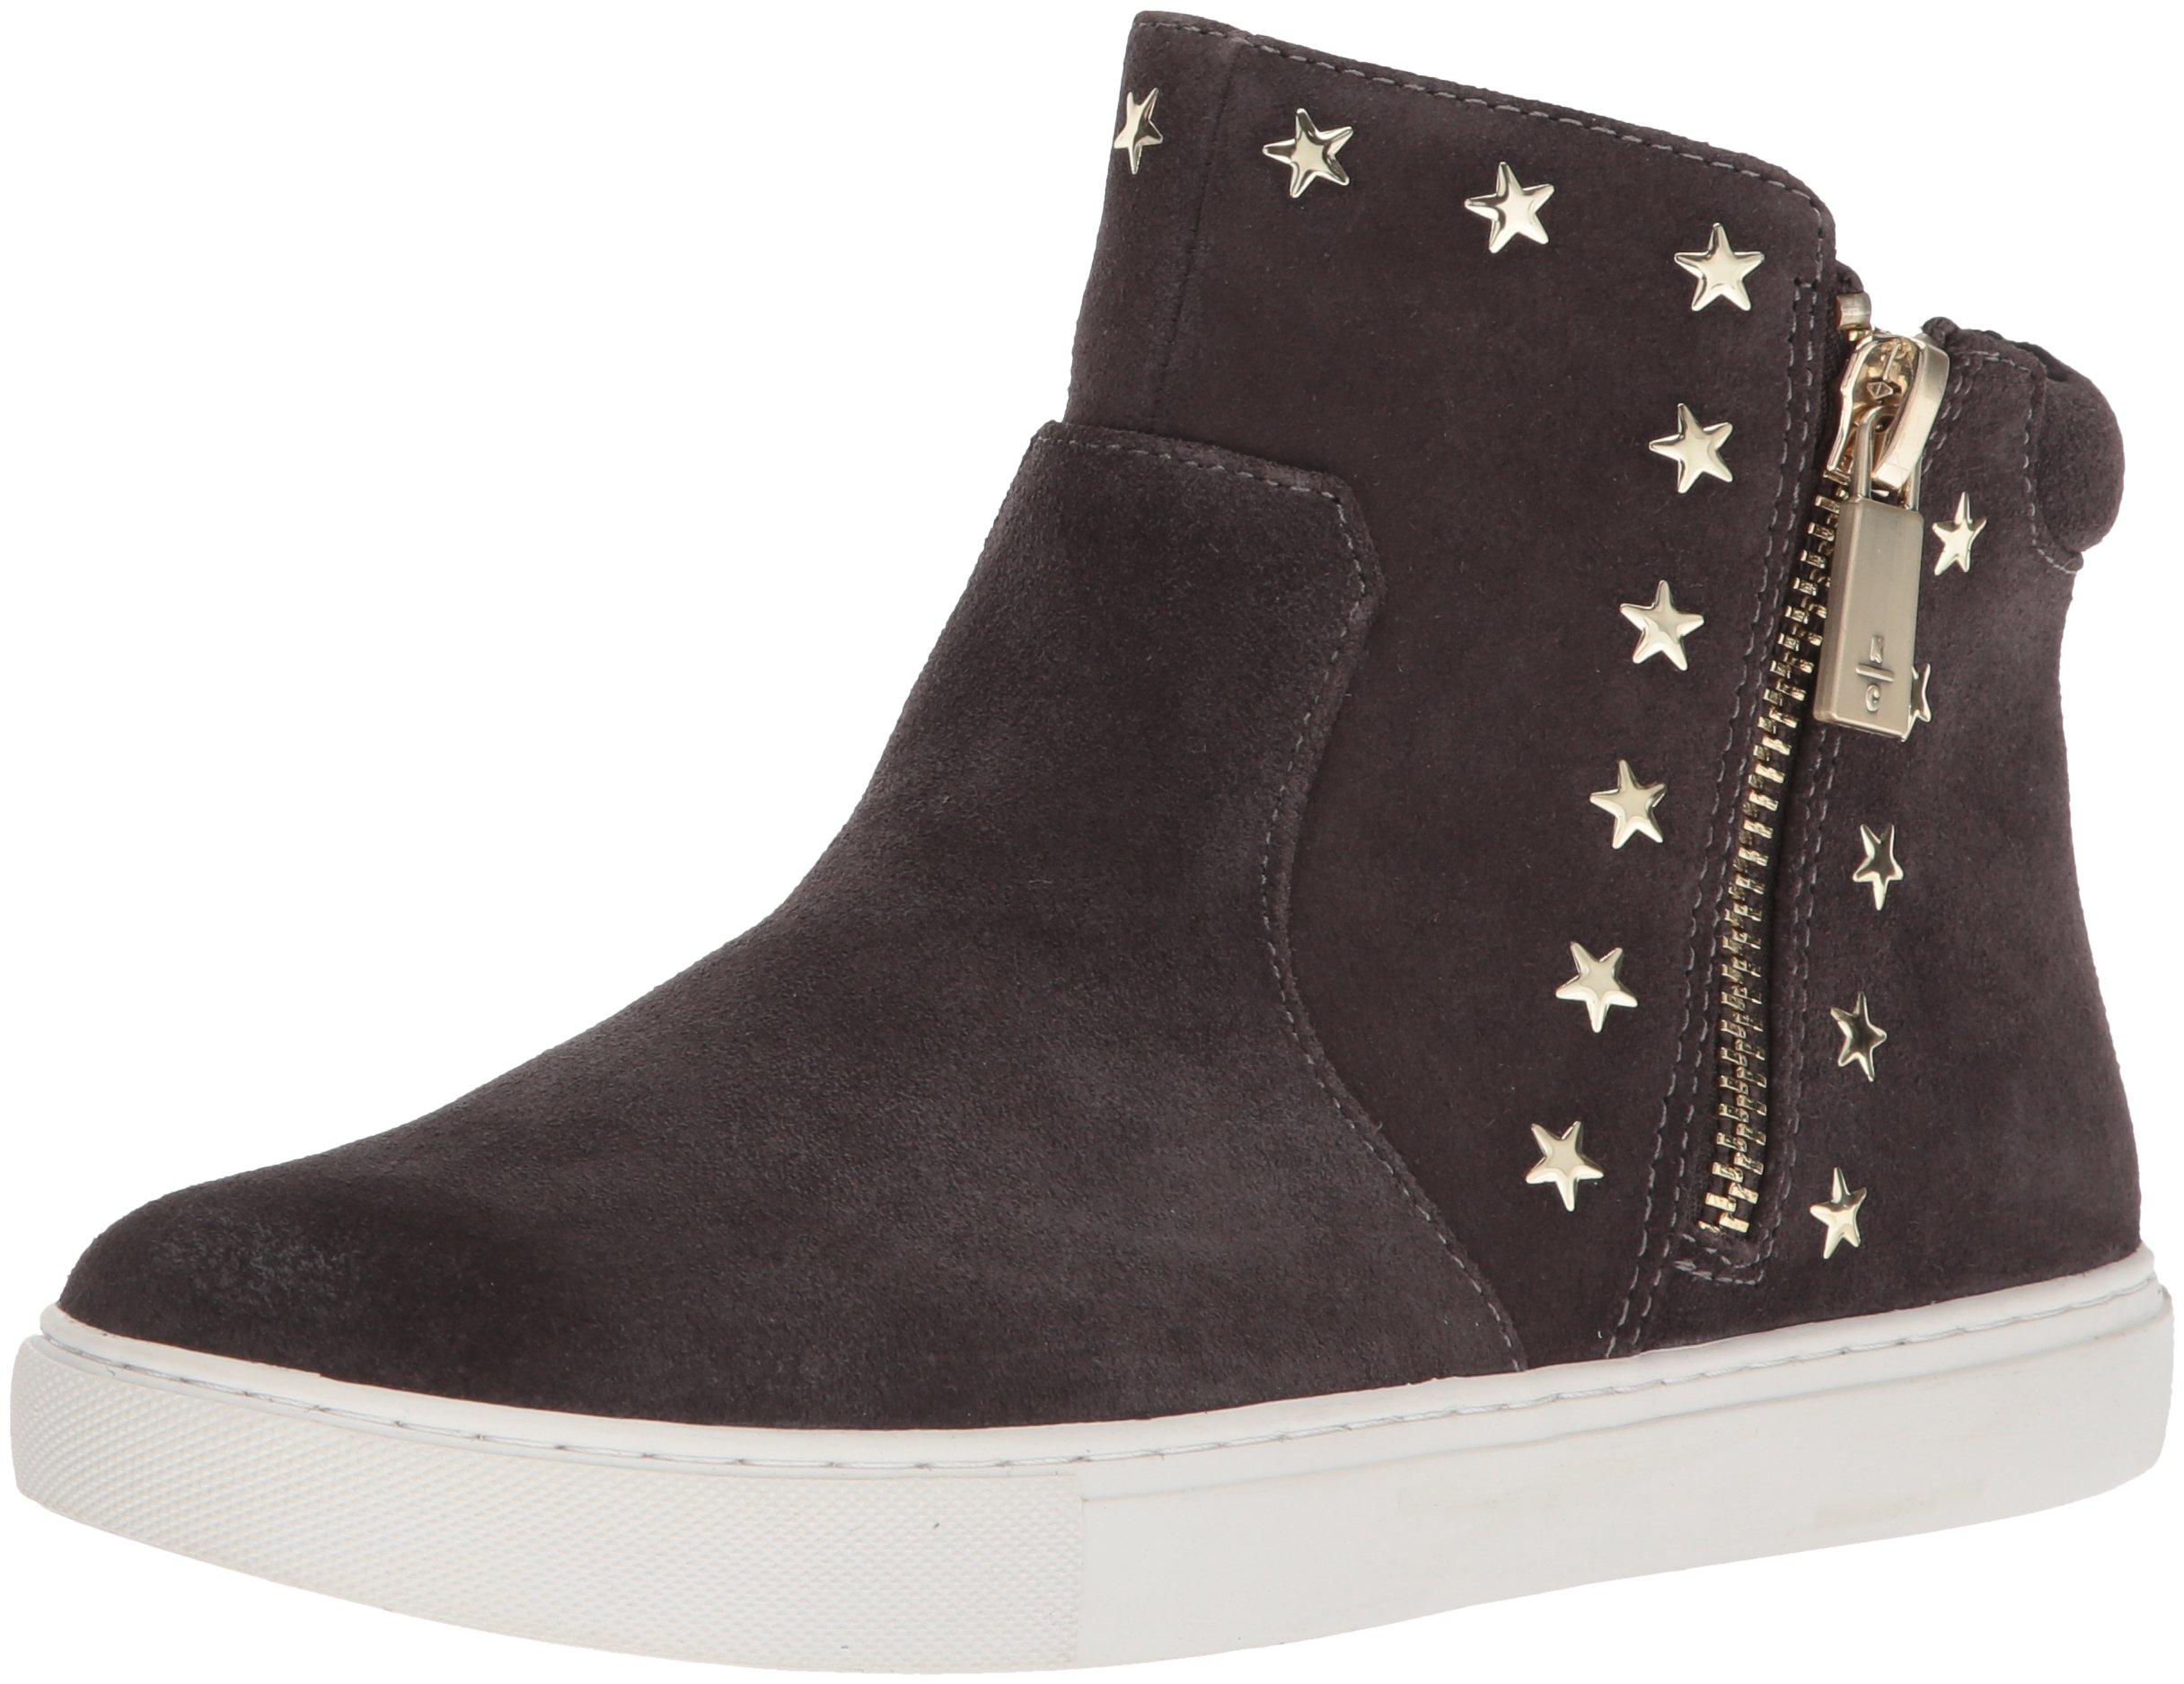 Kenneth Cole New York Women's Kiera Star Mid-height Zippers On Sides and Stud Embellishment Sneaker, Asphault, 8.5 Medium US